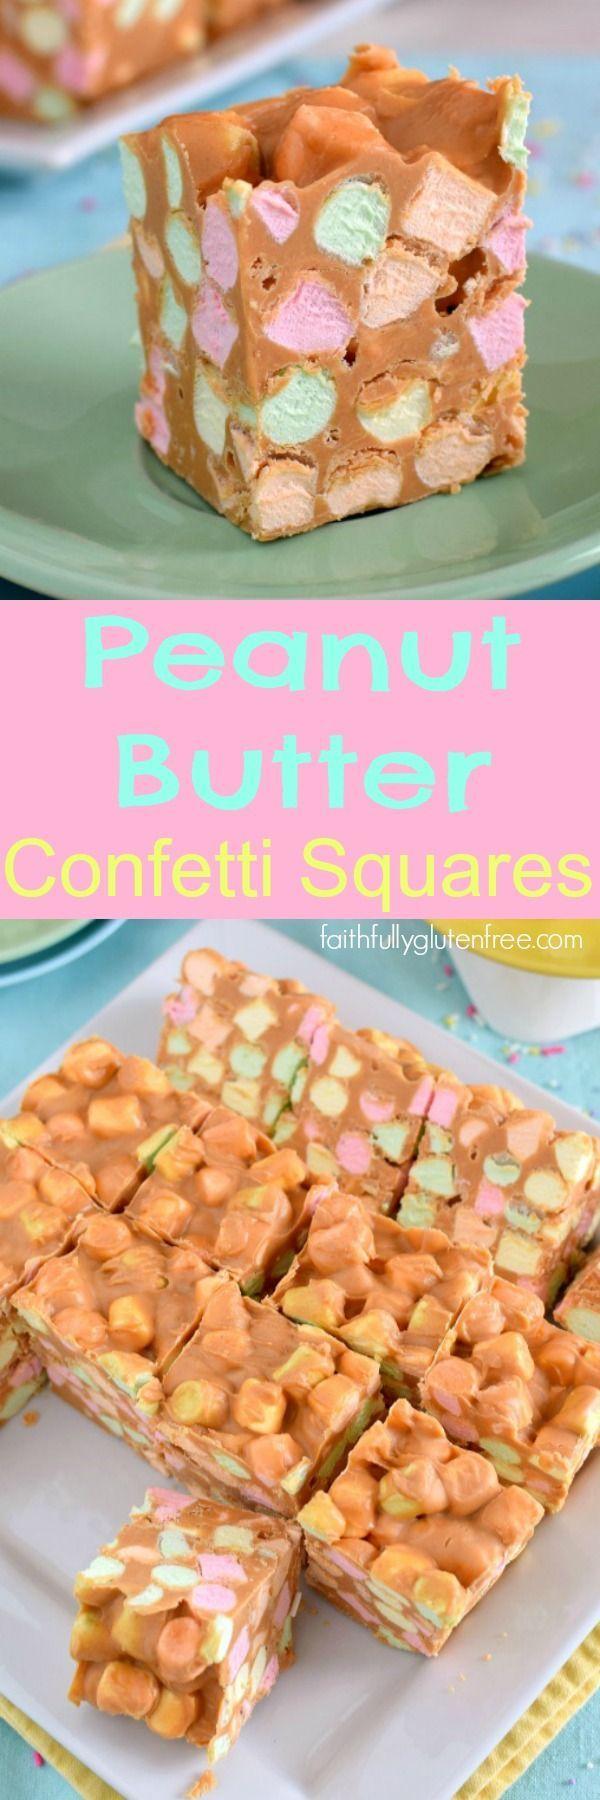 Peanut butter confetti squares recipe confetti peanut butter my grandma used to make these peanut butter confetti squares every easter what a treat negle Image collections